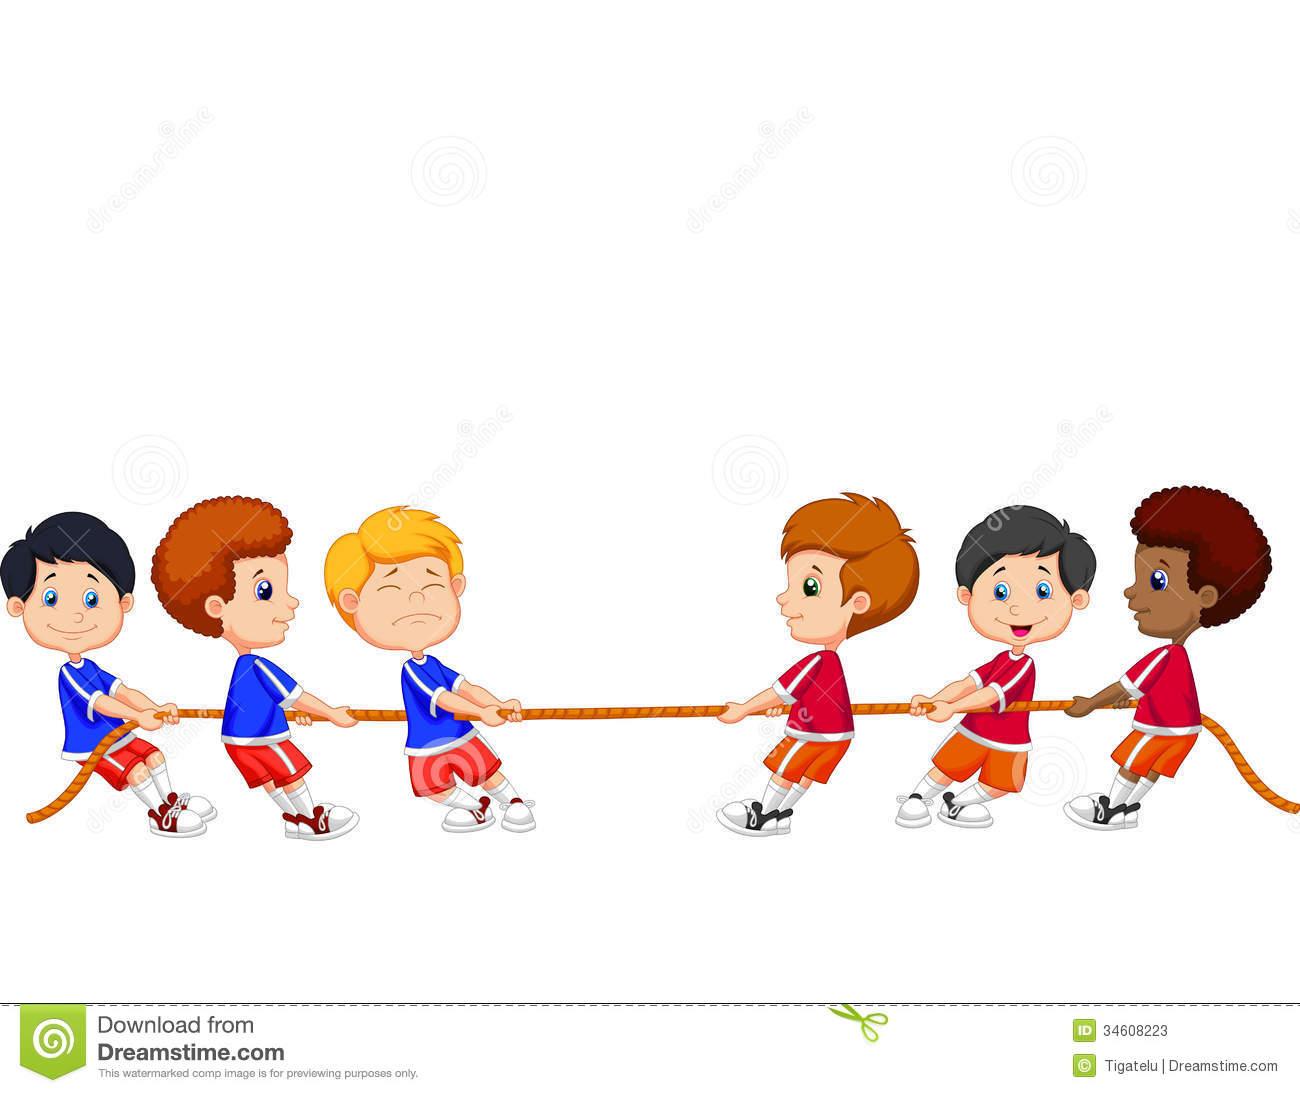 http://thumbs.dreamstime.com/z/group-cartoon-children-playing-tug-war-illustration-34608223.jpg